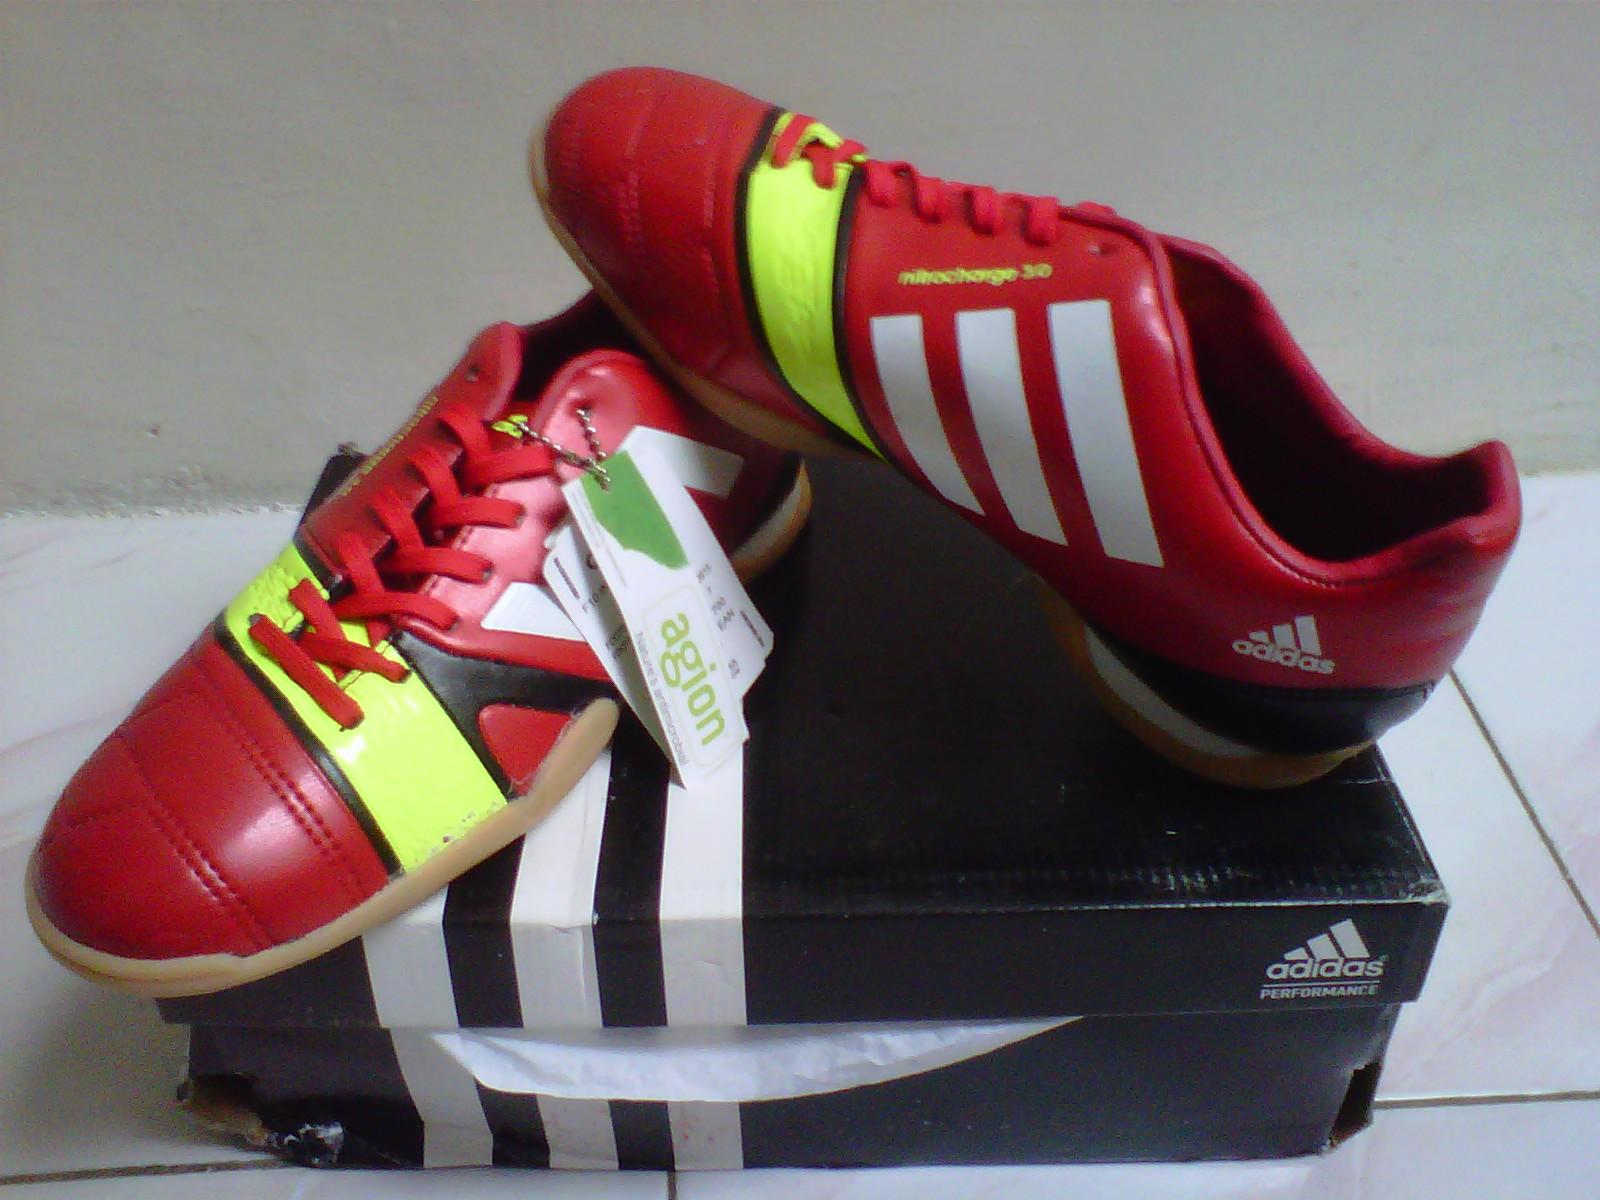 Sepatu Futsal Adidas Terbaru Adidas Nitrocharge Grosir Sepatu